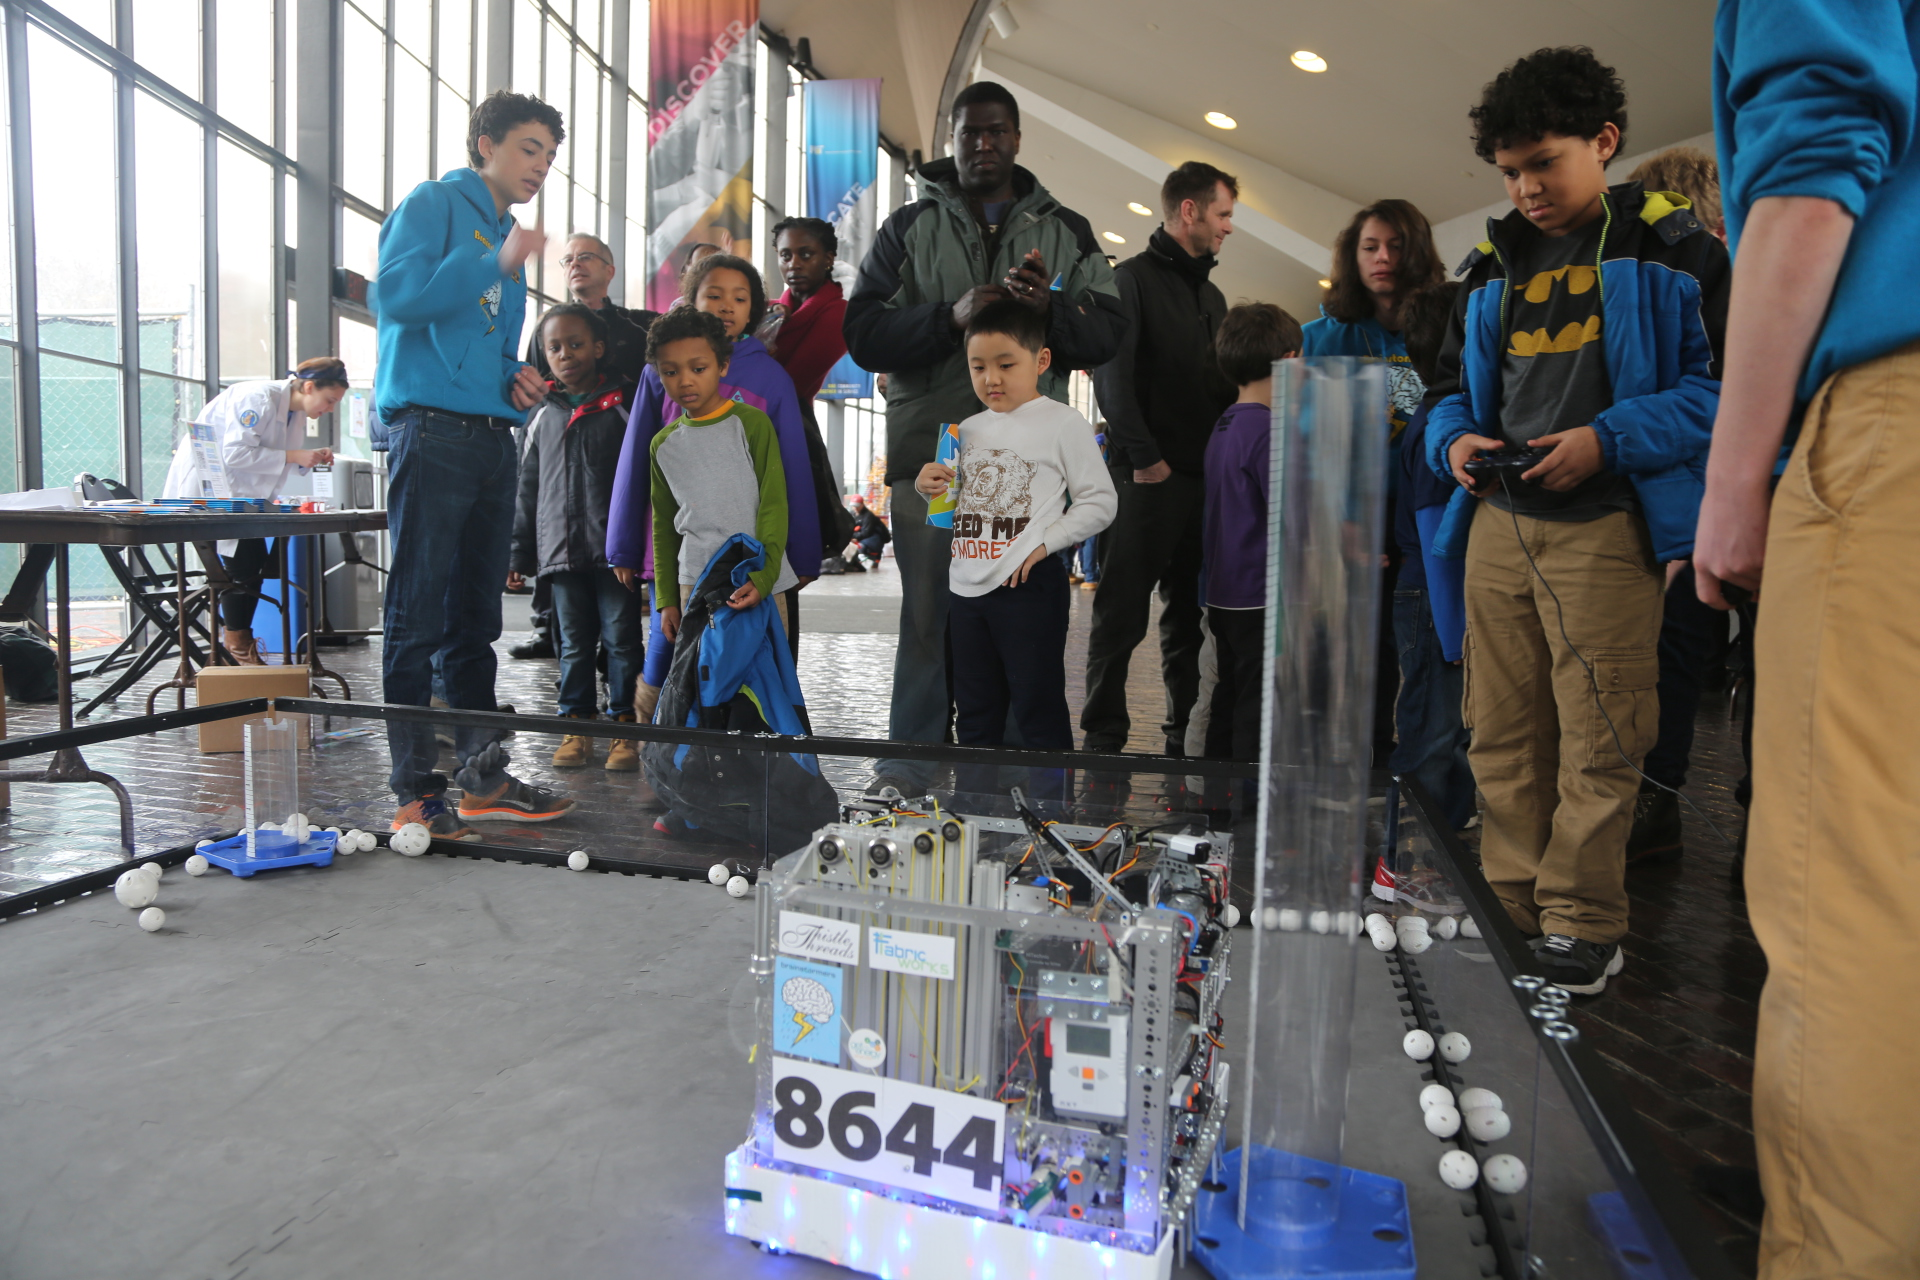 MIT Science Saturday